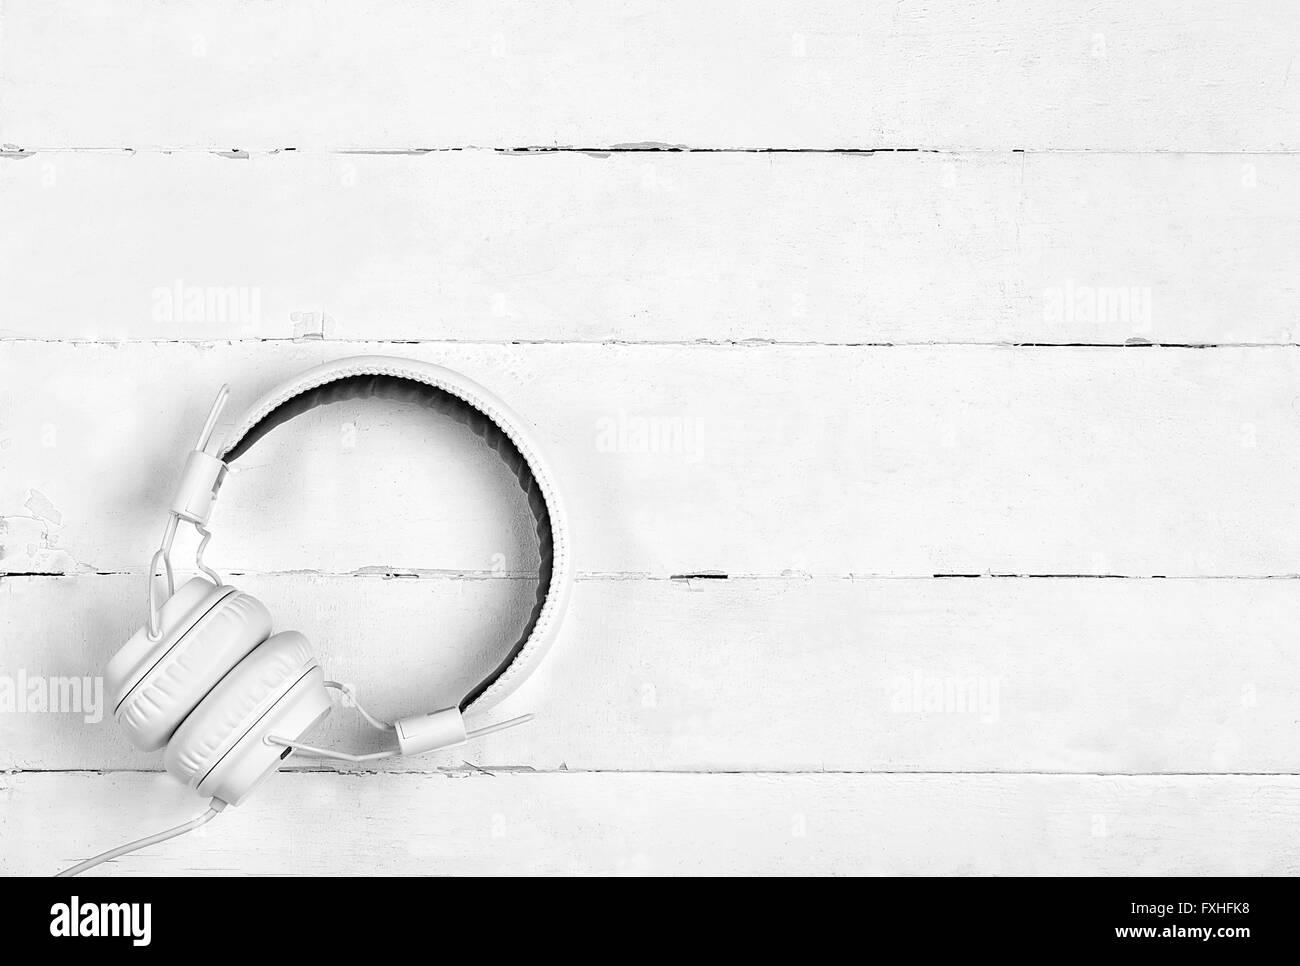 White headphones on white wooden table - Stock Image